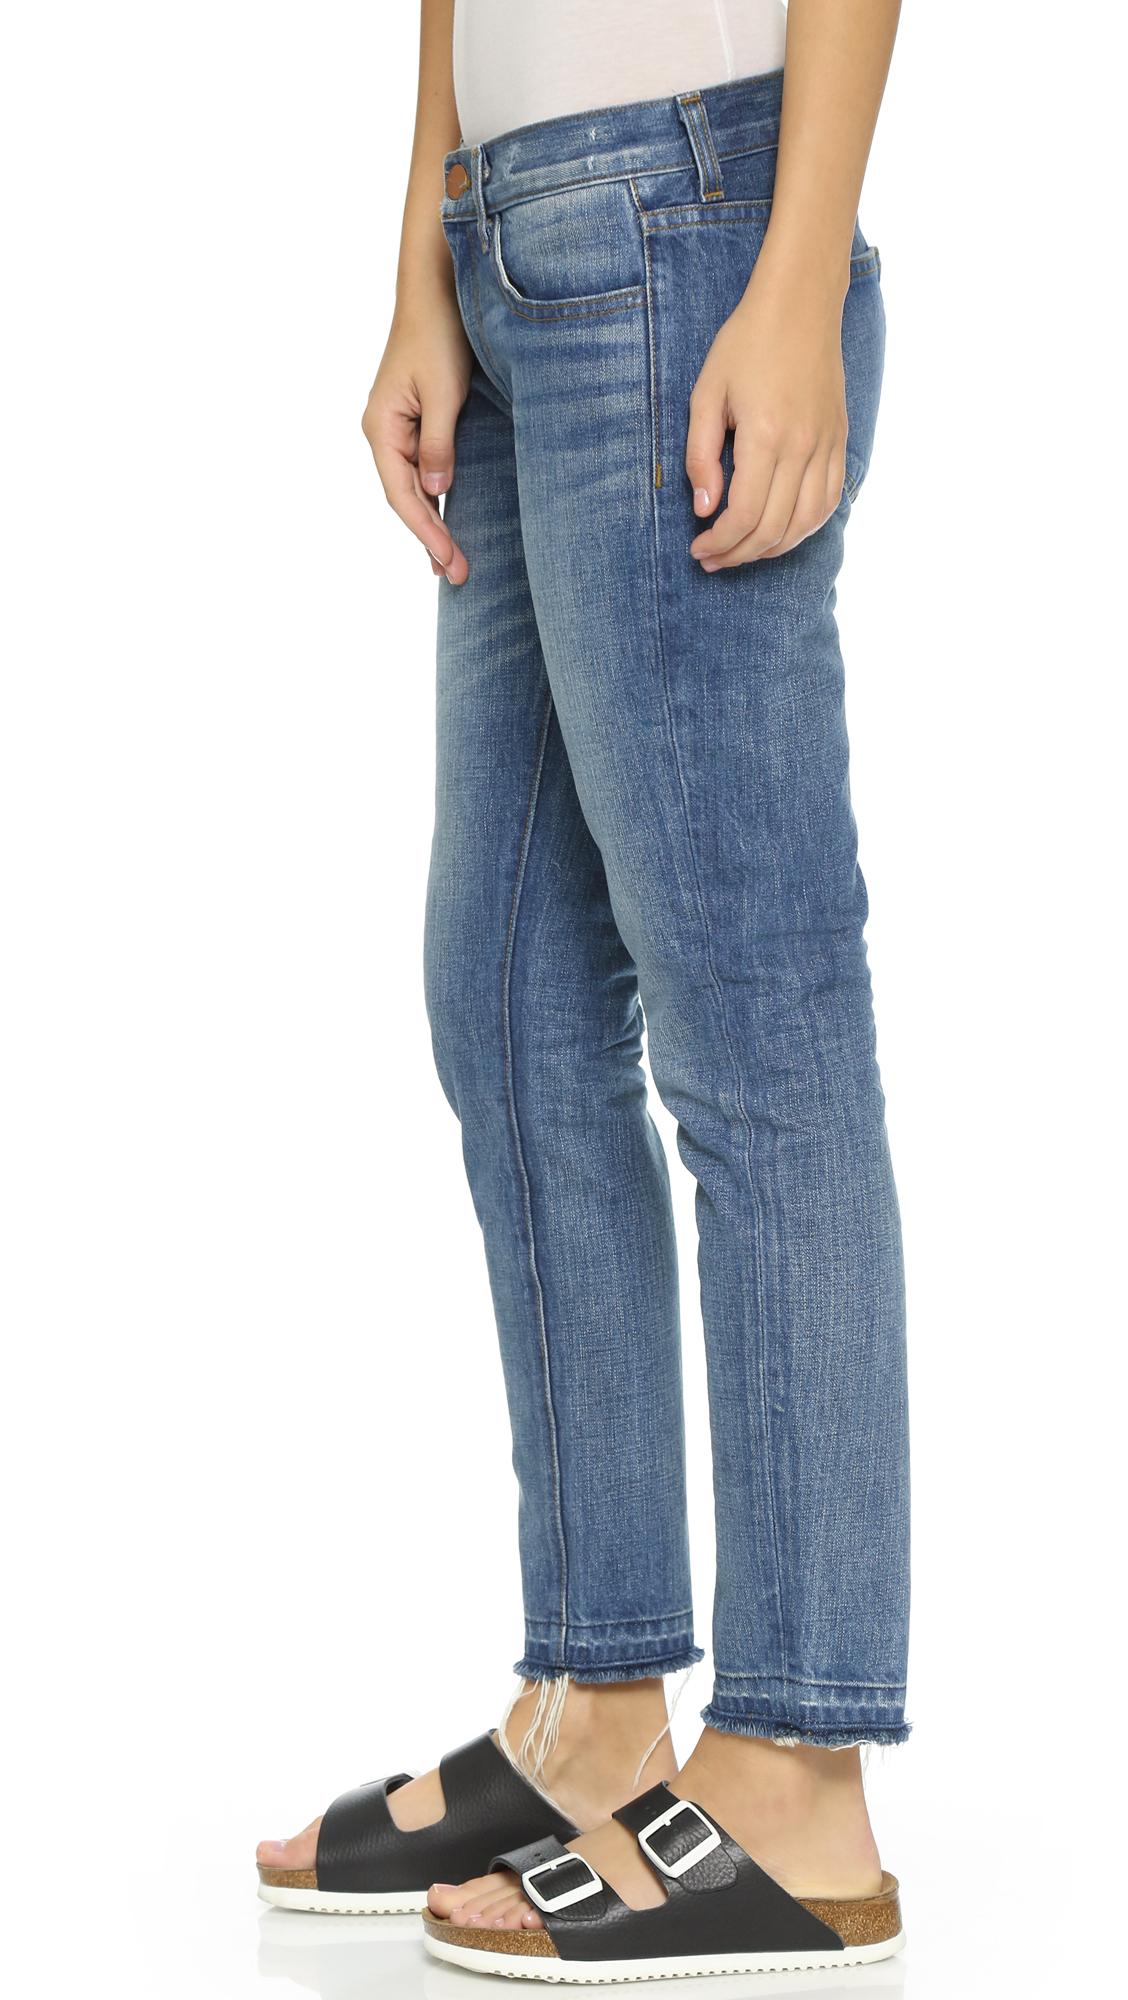 Cheap And Nice Buy Cheap Manchester DENIM - Denim trousers Crippen Buy Cheap Largest Supplier Cheap Sale Shop Discount Factory Outlet Iqovvk